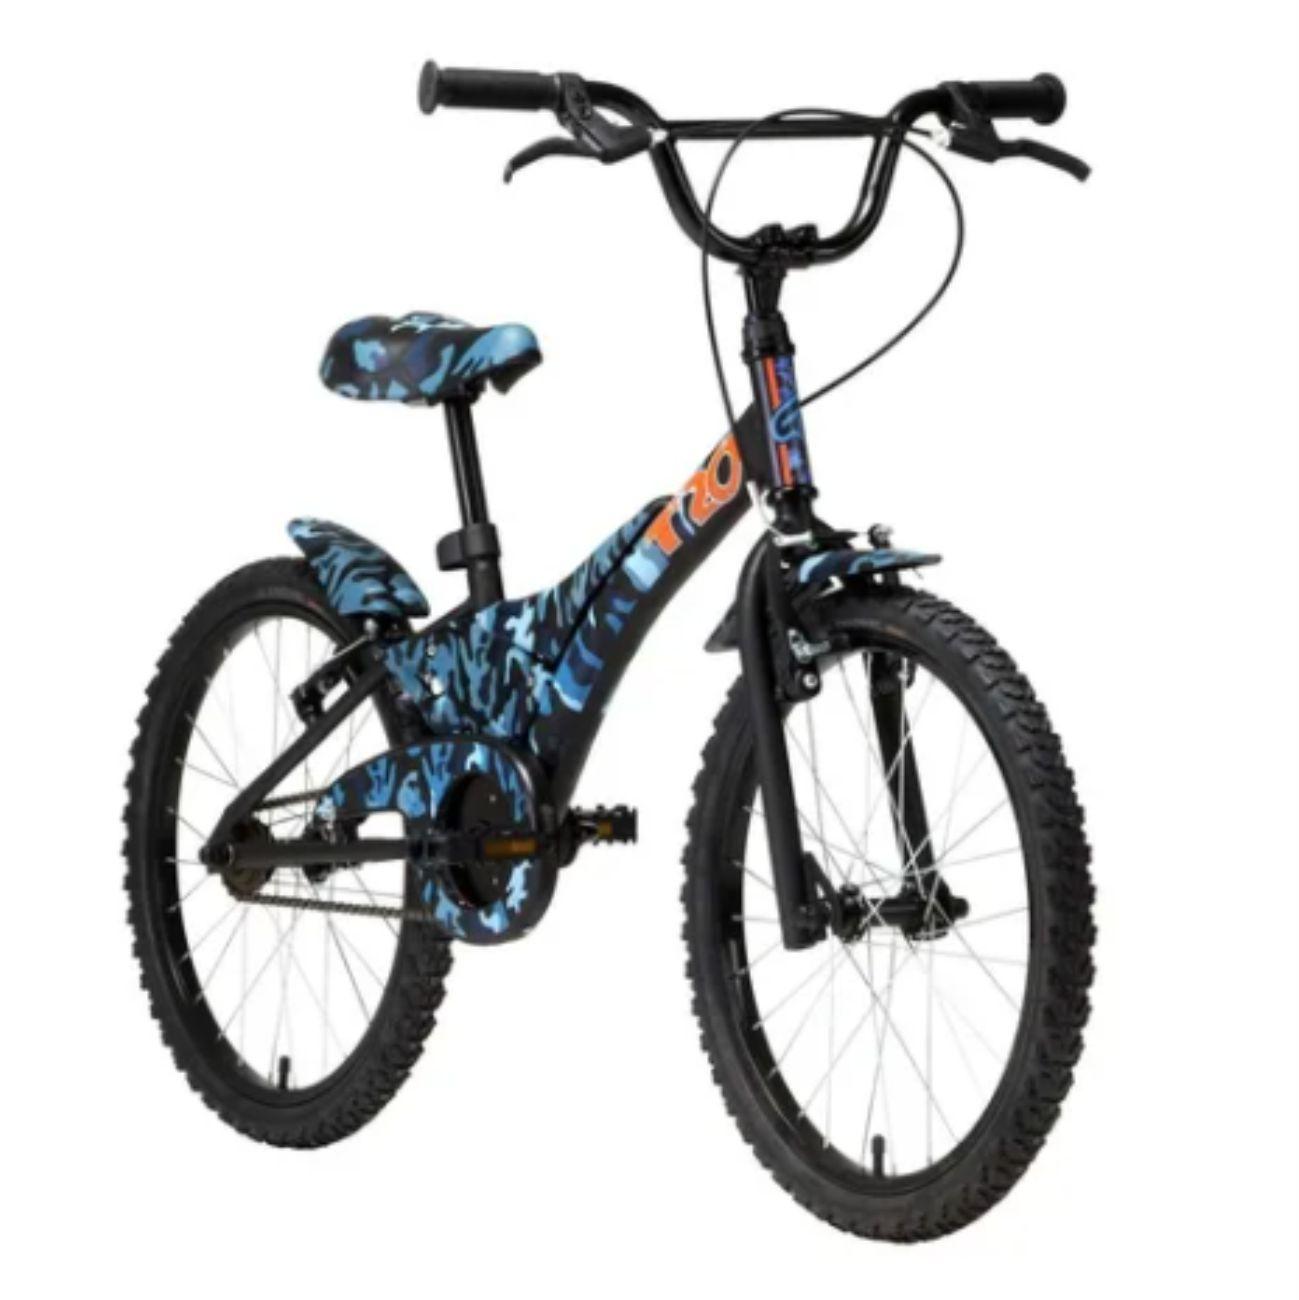 Bicicleta Infantil Aro 20 Groove T20